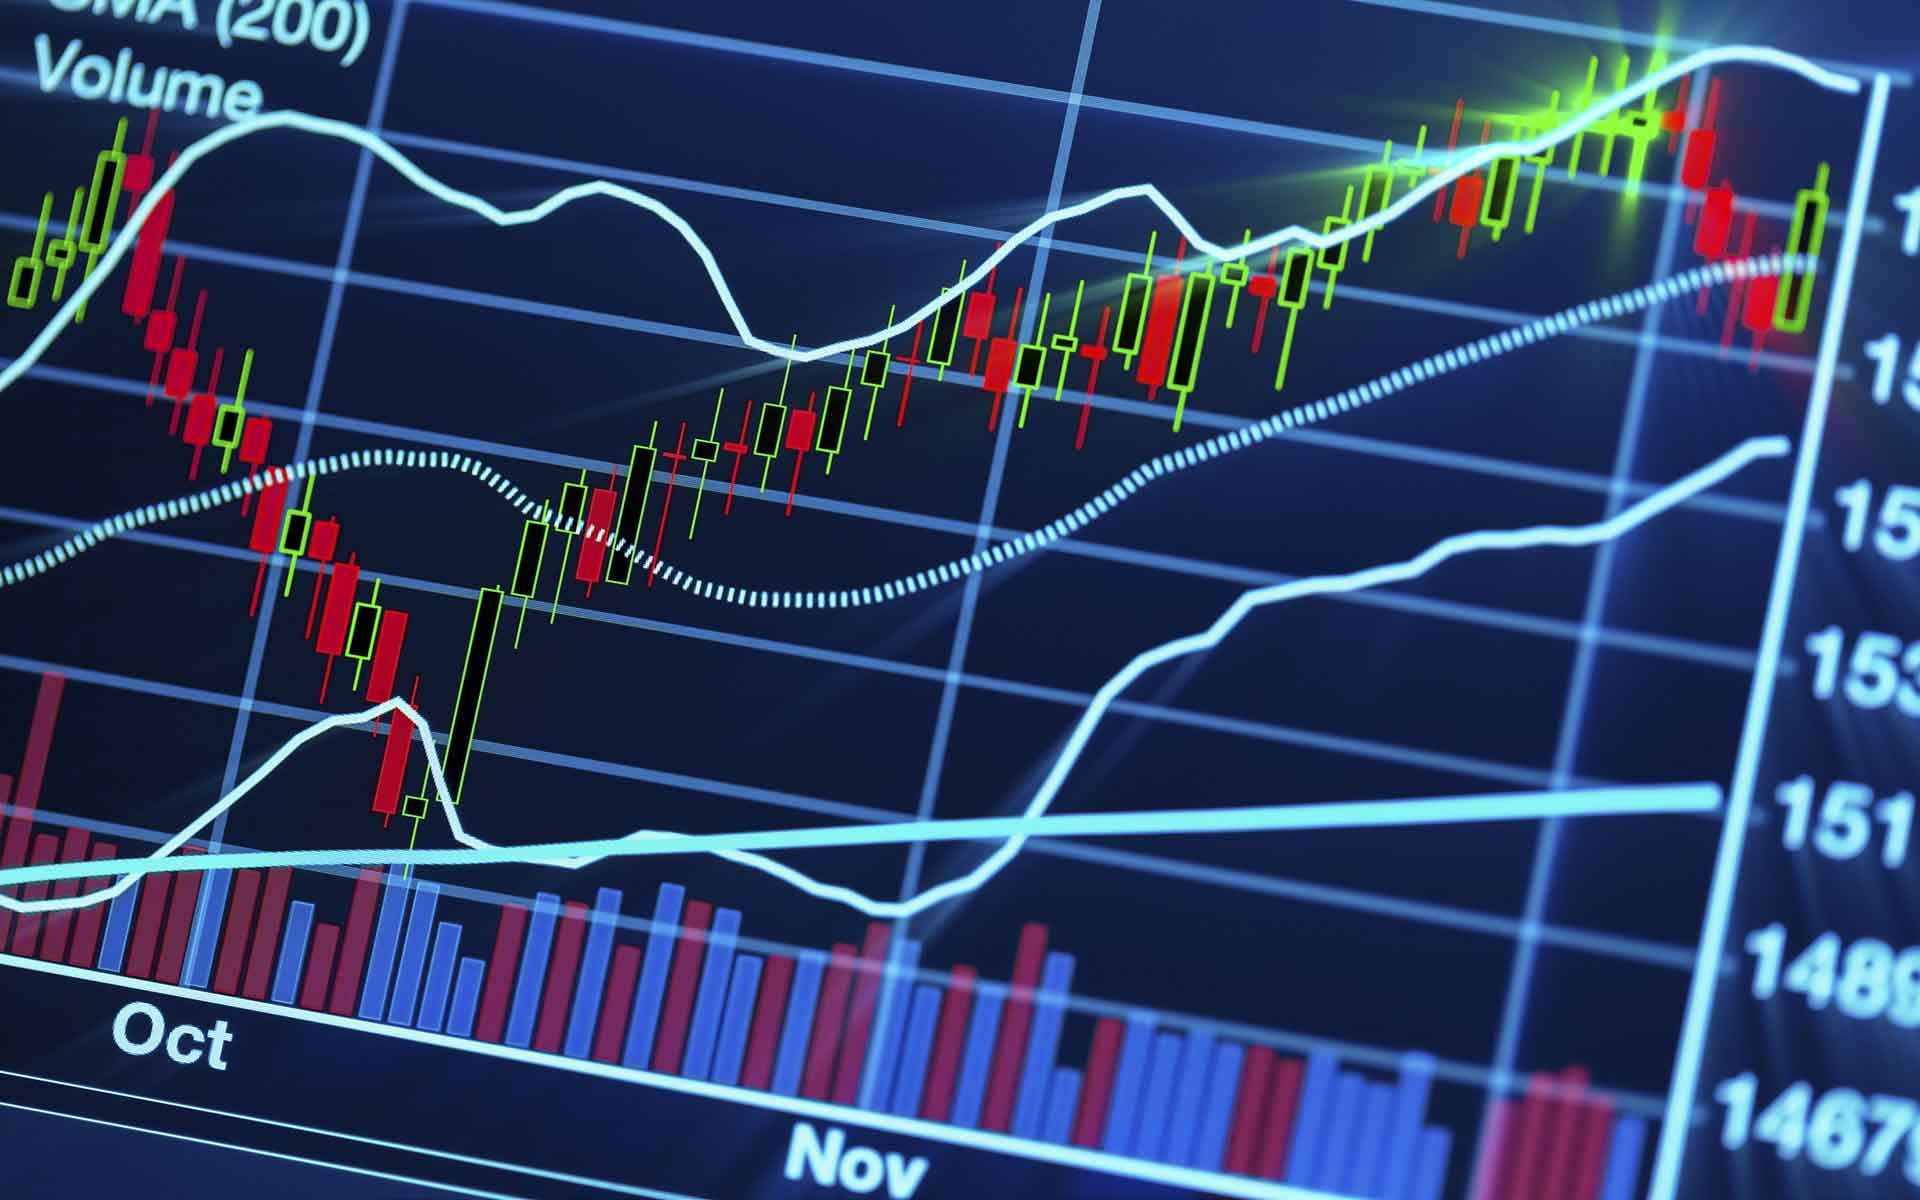 Stock Market Background Wallpaper 23326   Baltana 1920x1200